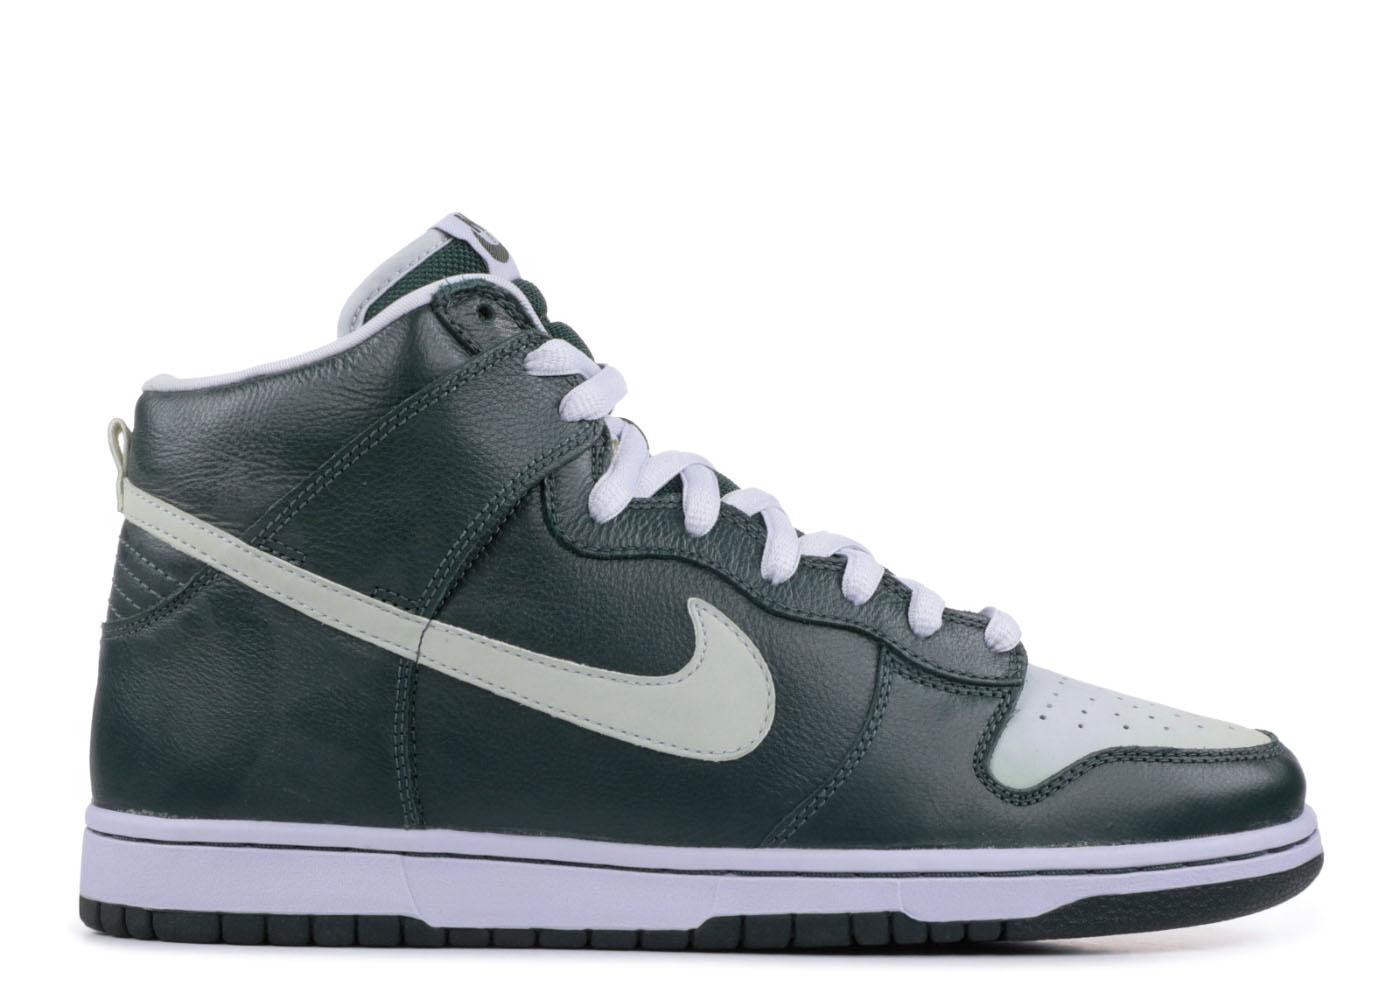 Nike Dunk High Pro SB Ghost - 305050-302